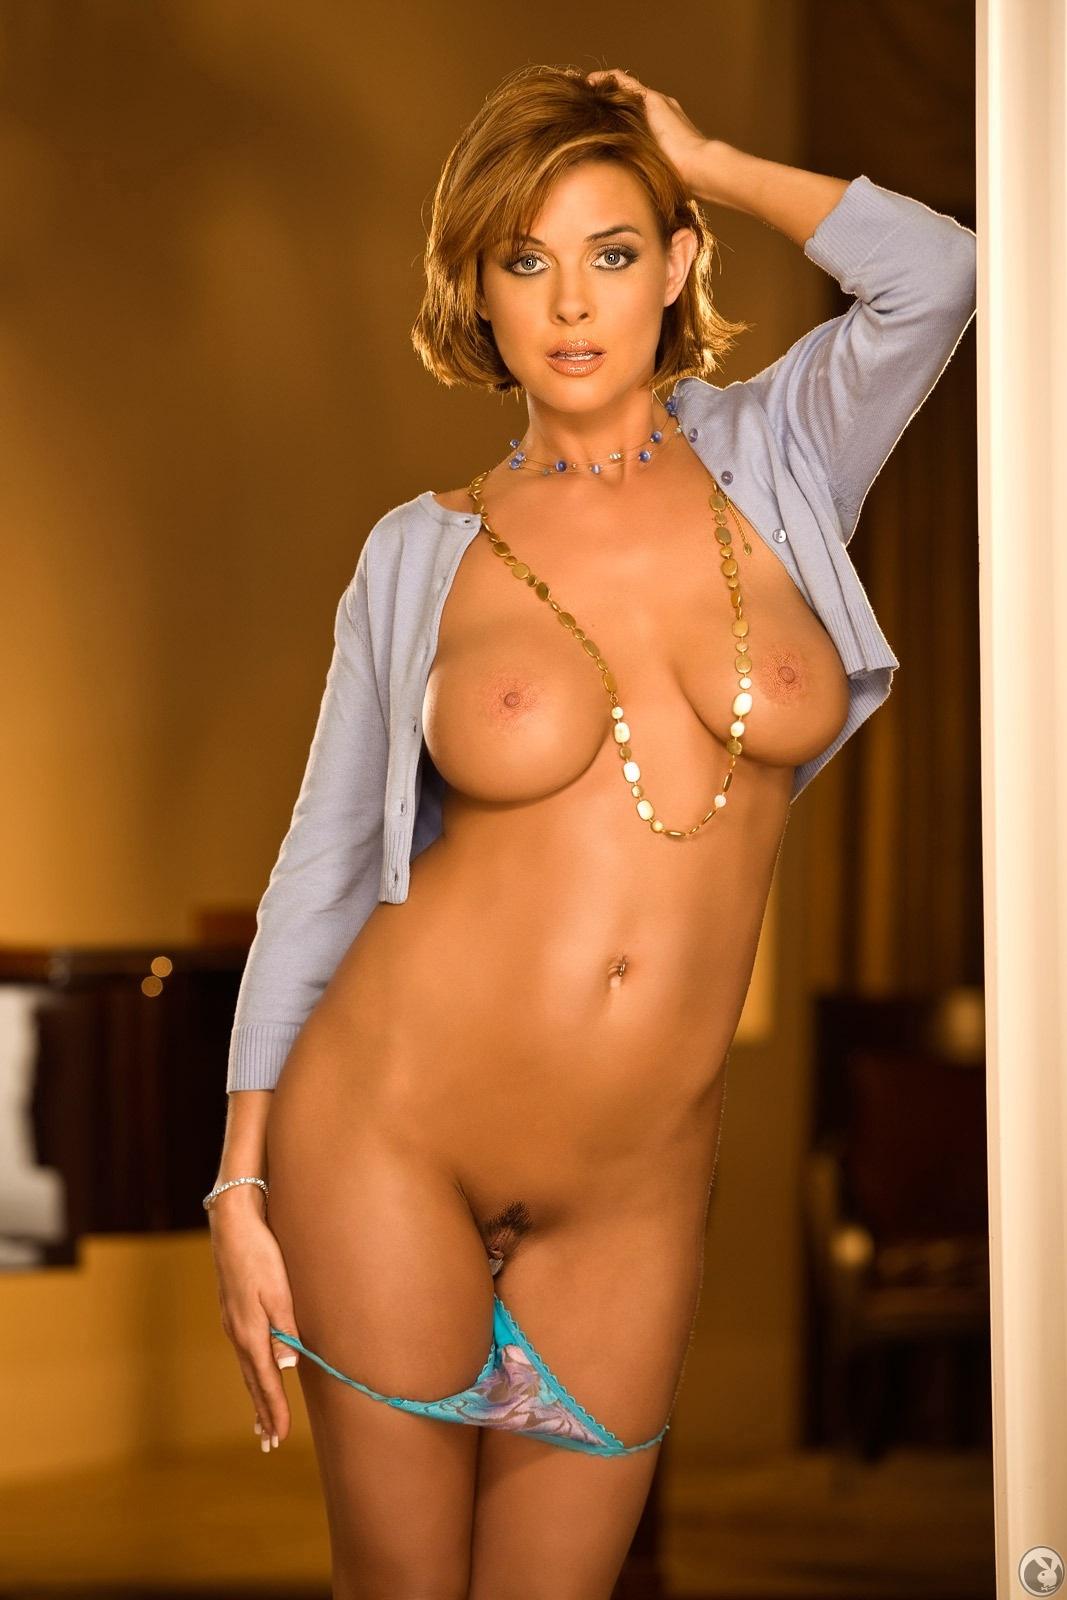 big breasted females nude